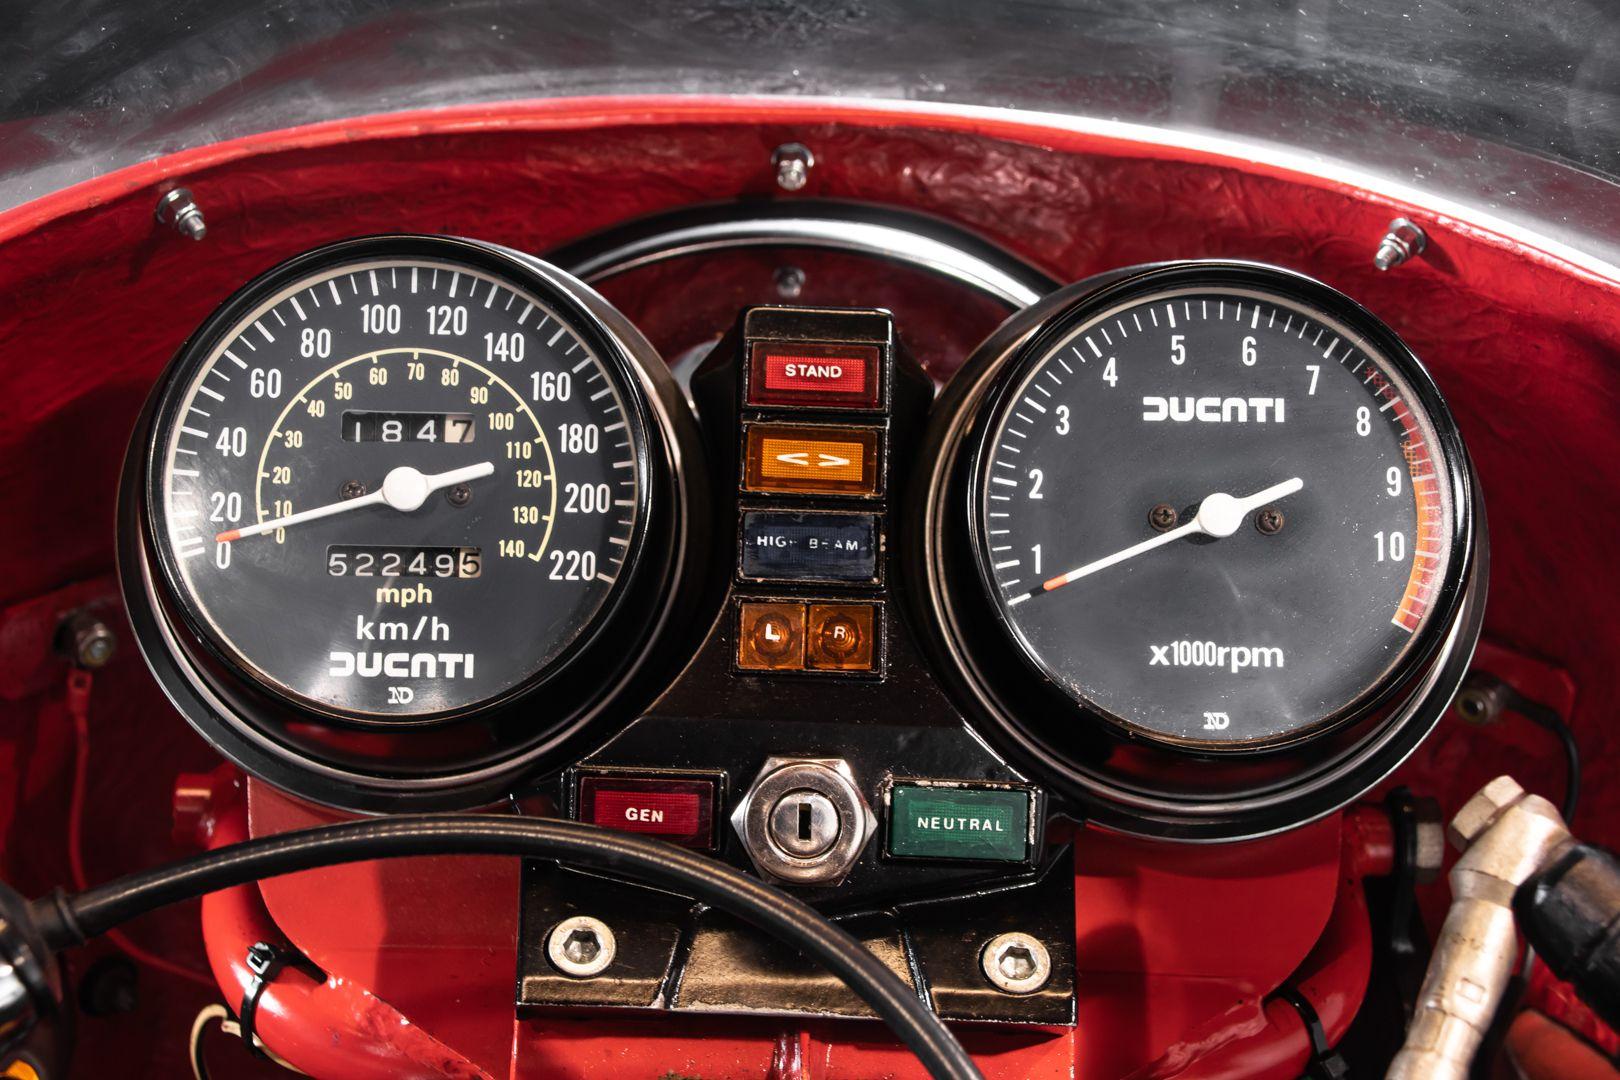 1983 Ducati 900 Mike Hailwood Replica 71431